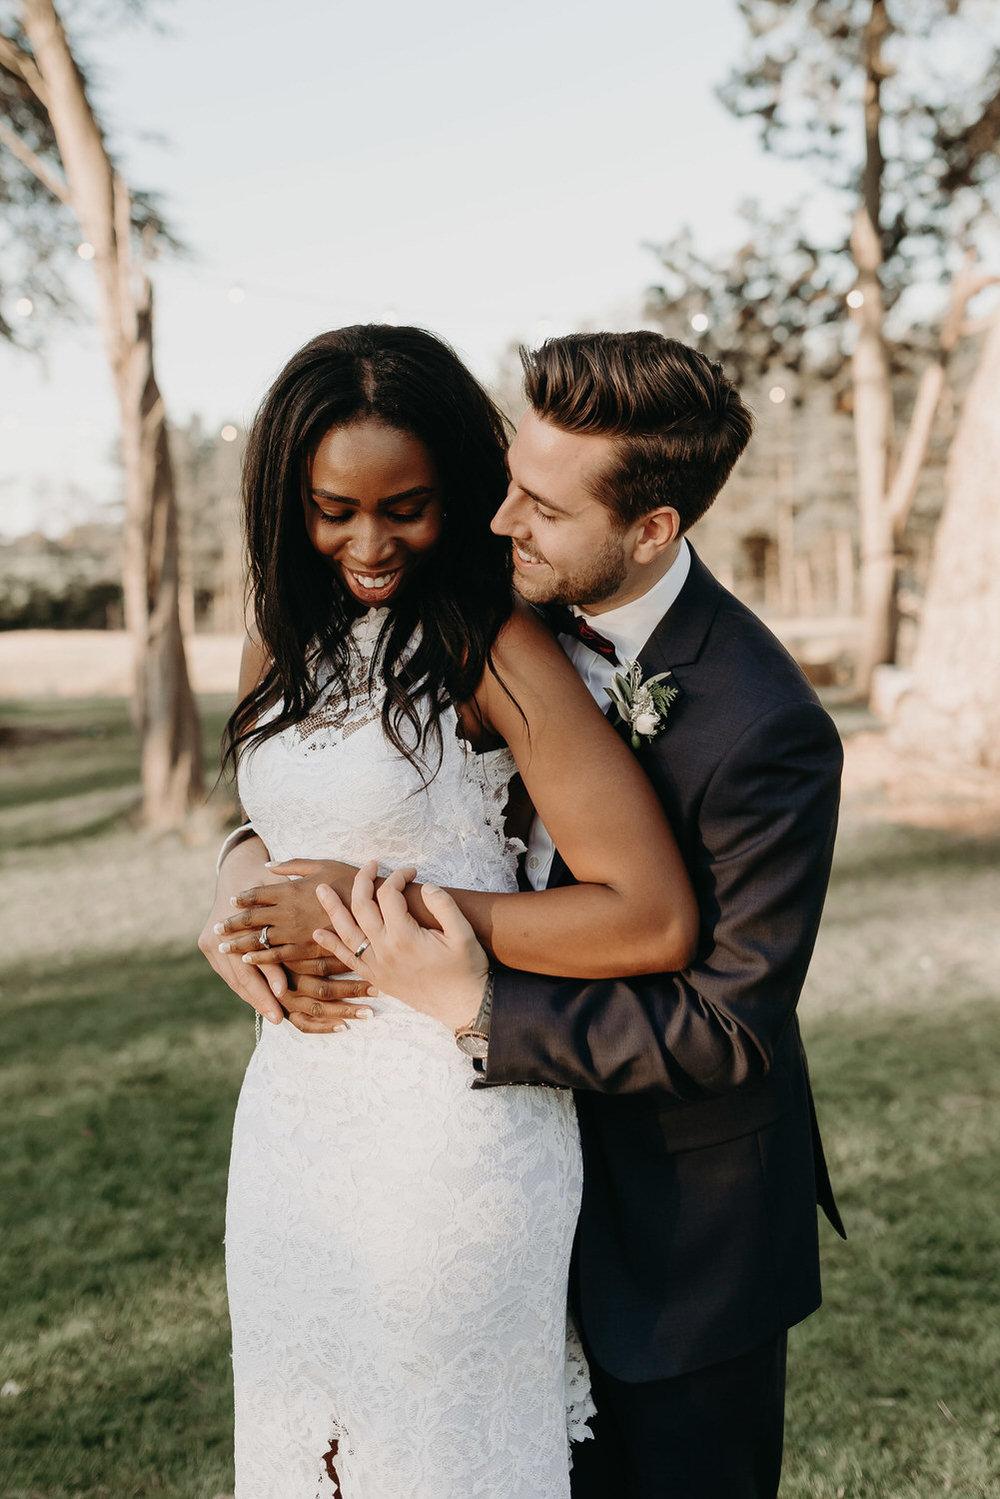 wedding-photographer-brook-farm-cuffley-3.jpg